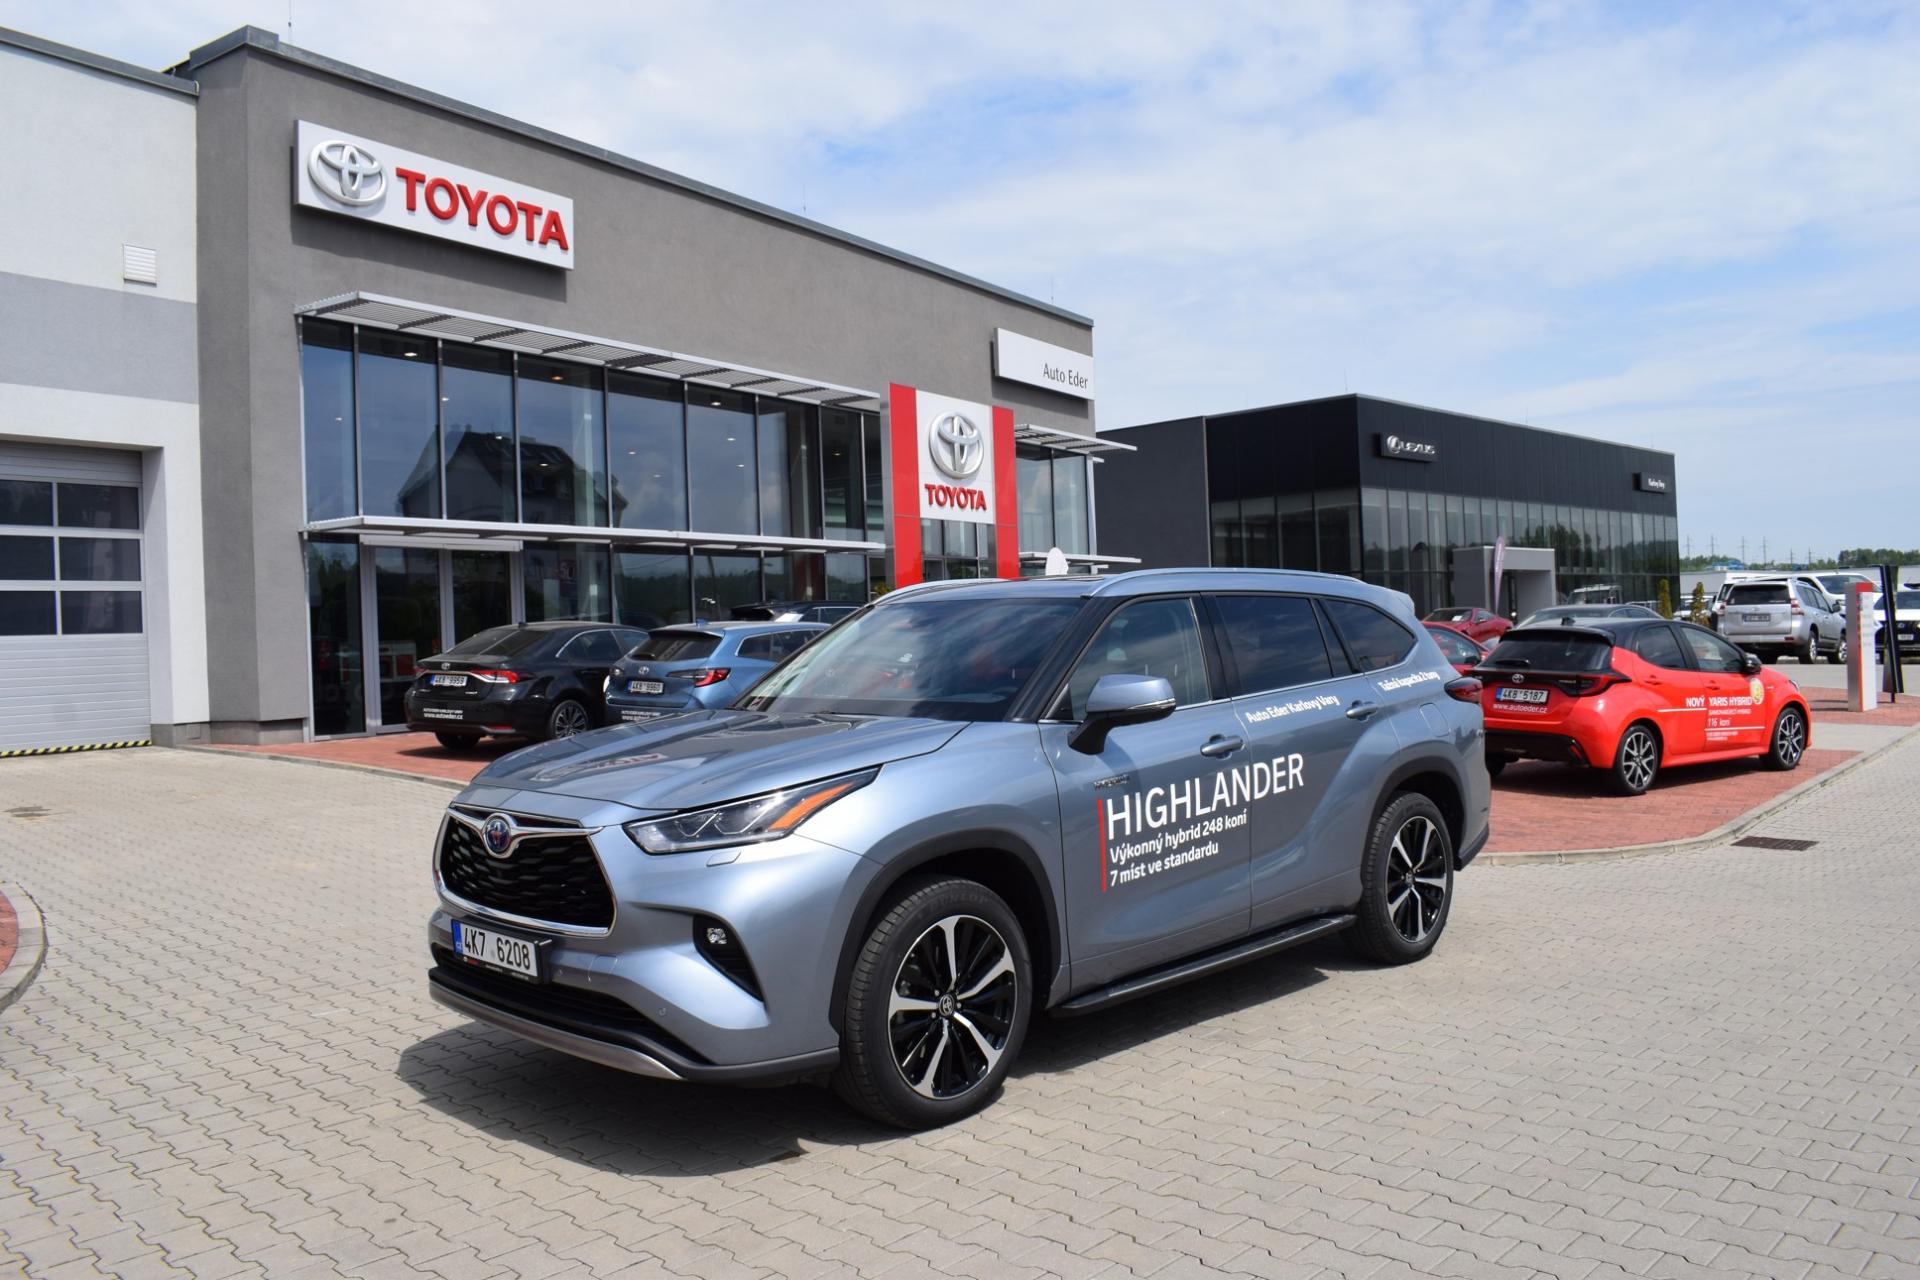 Toyota HIGHLANDER 2,5 Hybrid (248 k) aut. převodovka e-CVT AWD-i benzin Executive